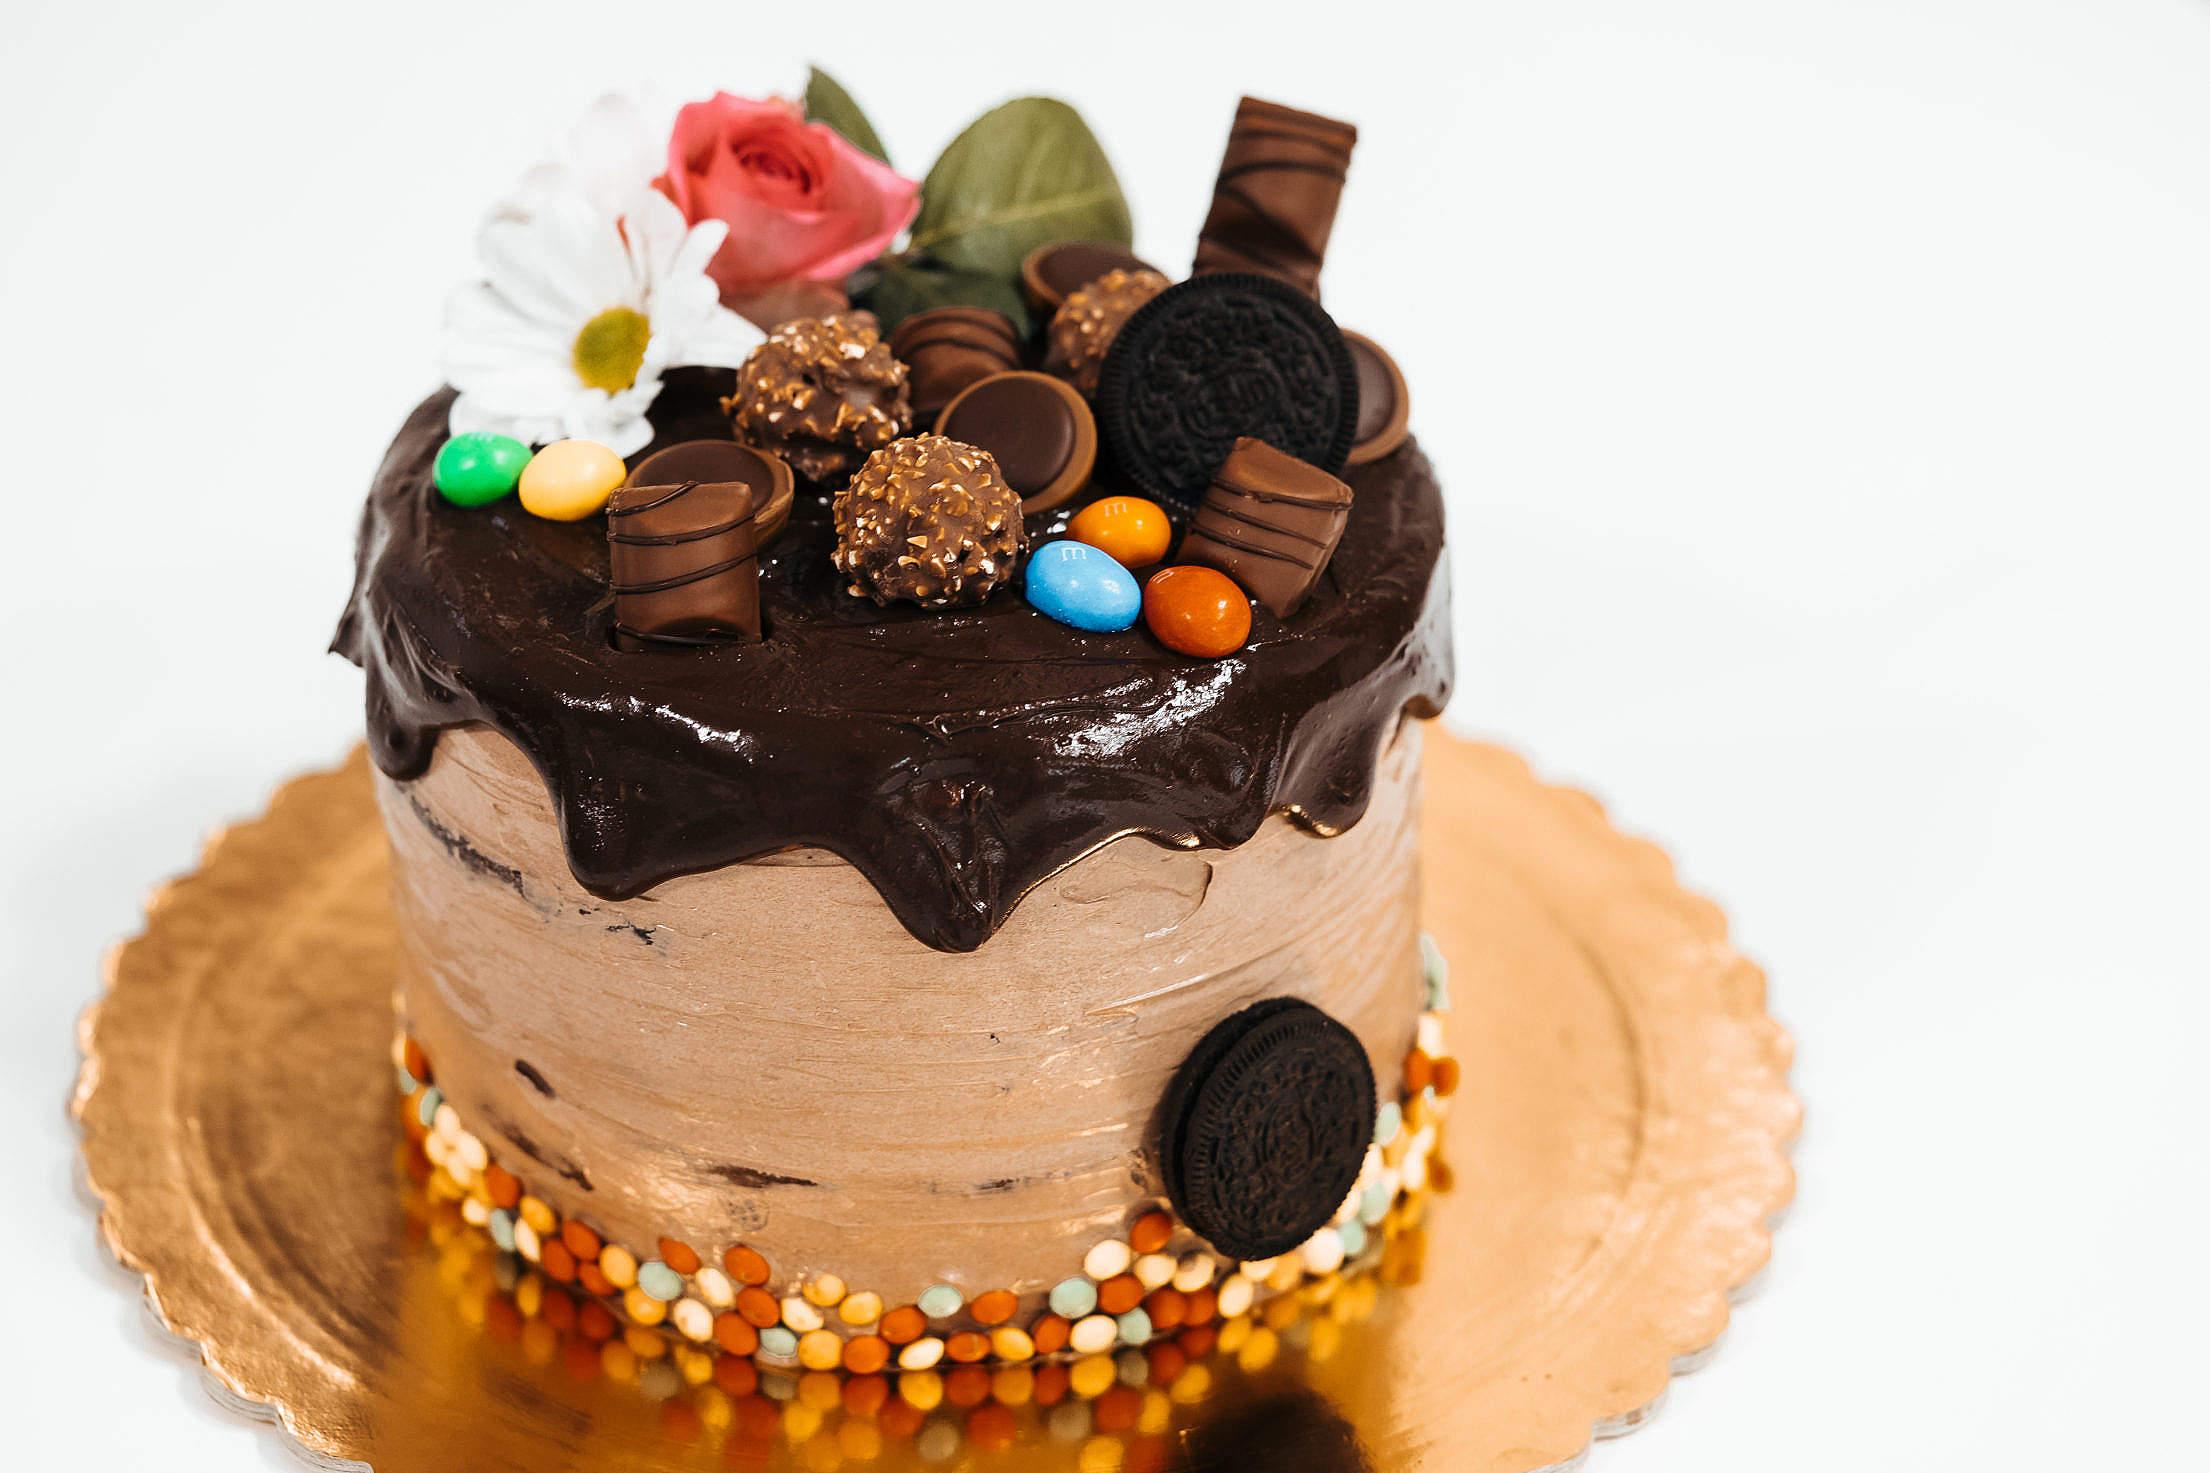 Birthday Cake with Chocolate Decorations Free Stock Photo